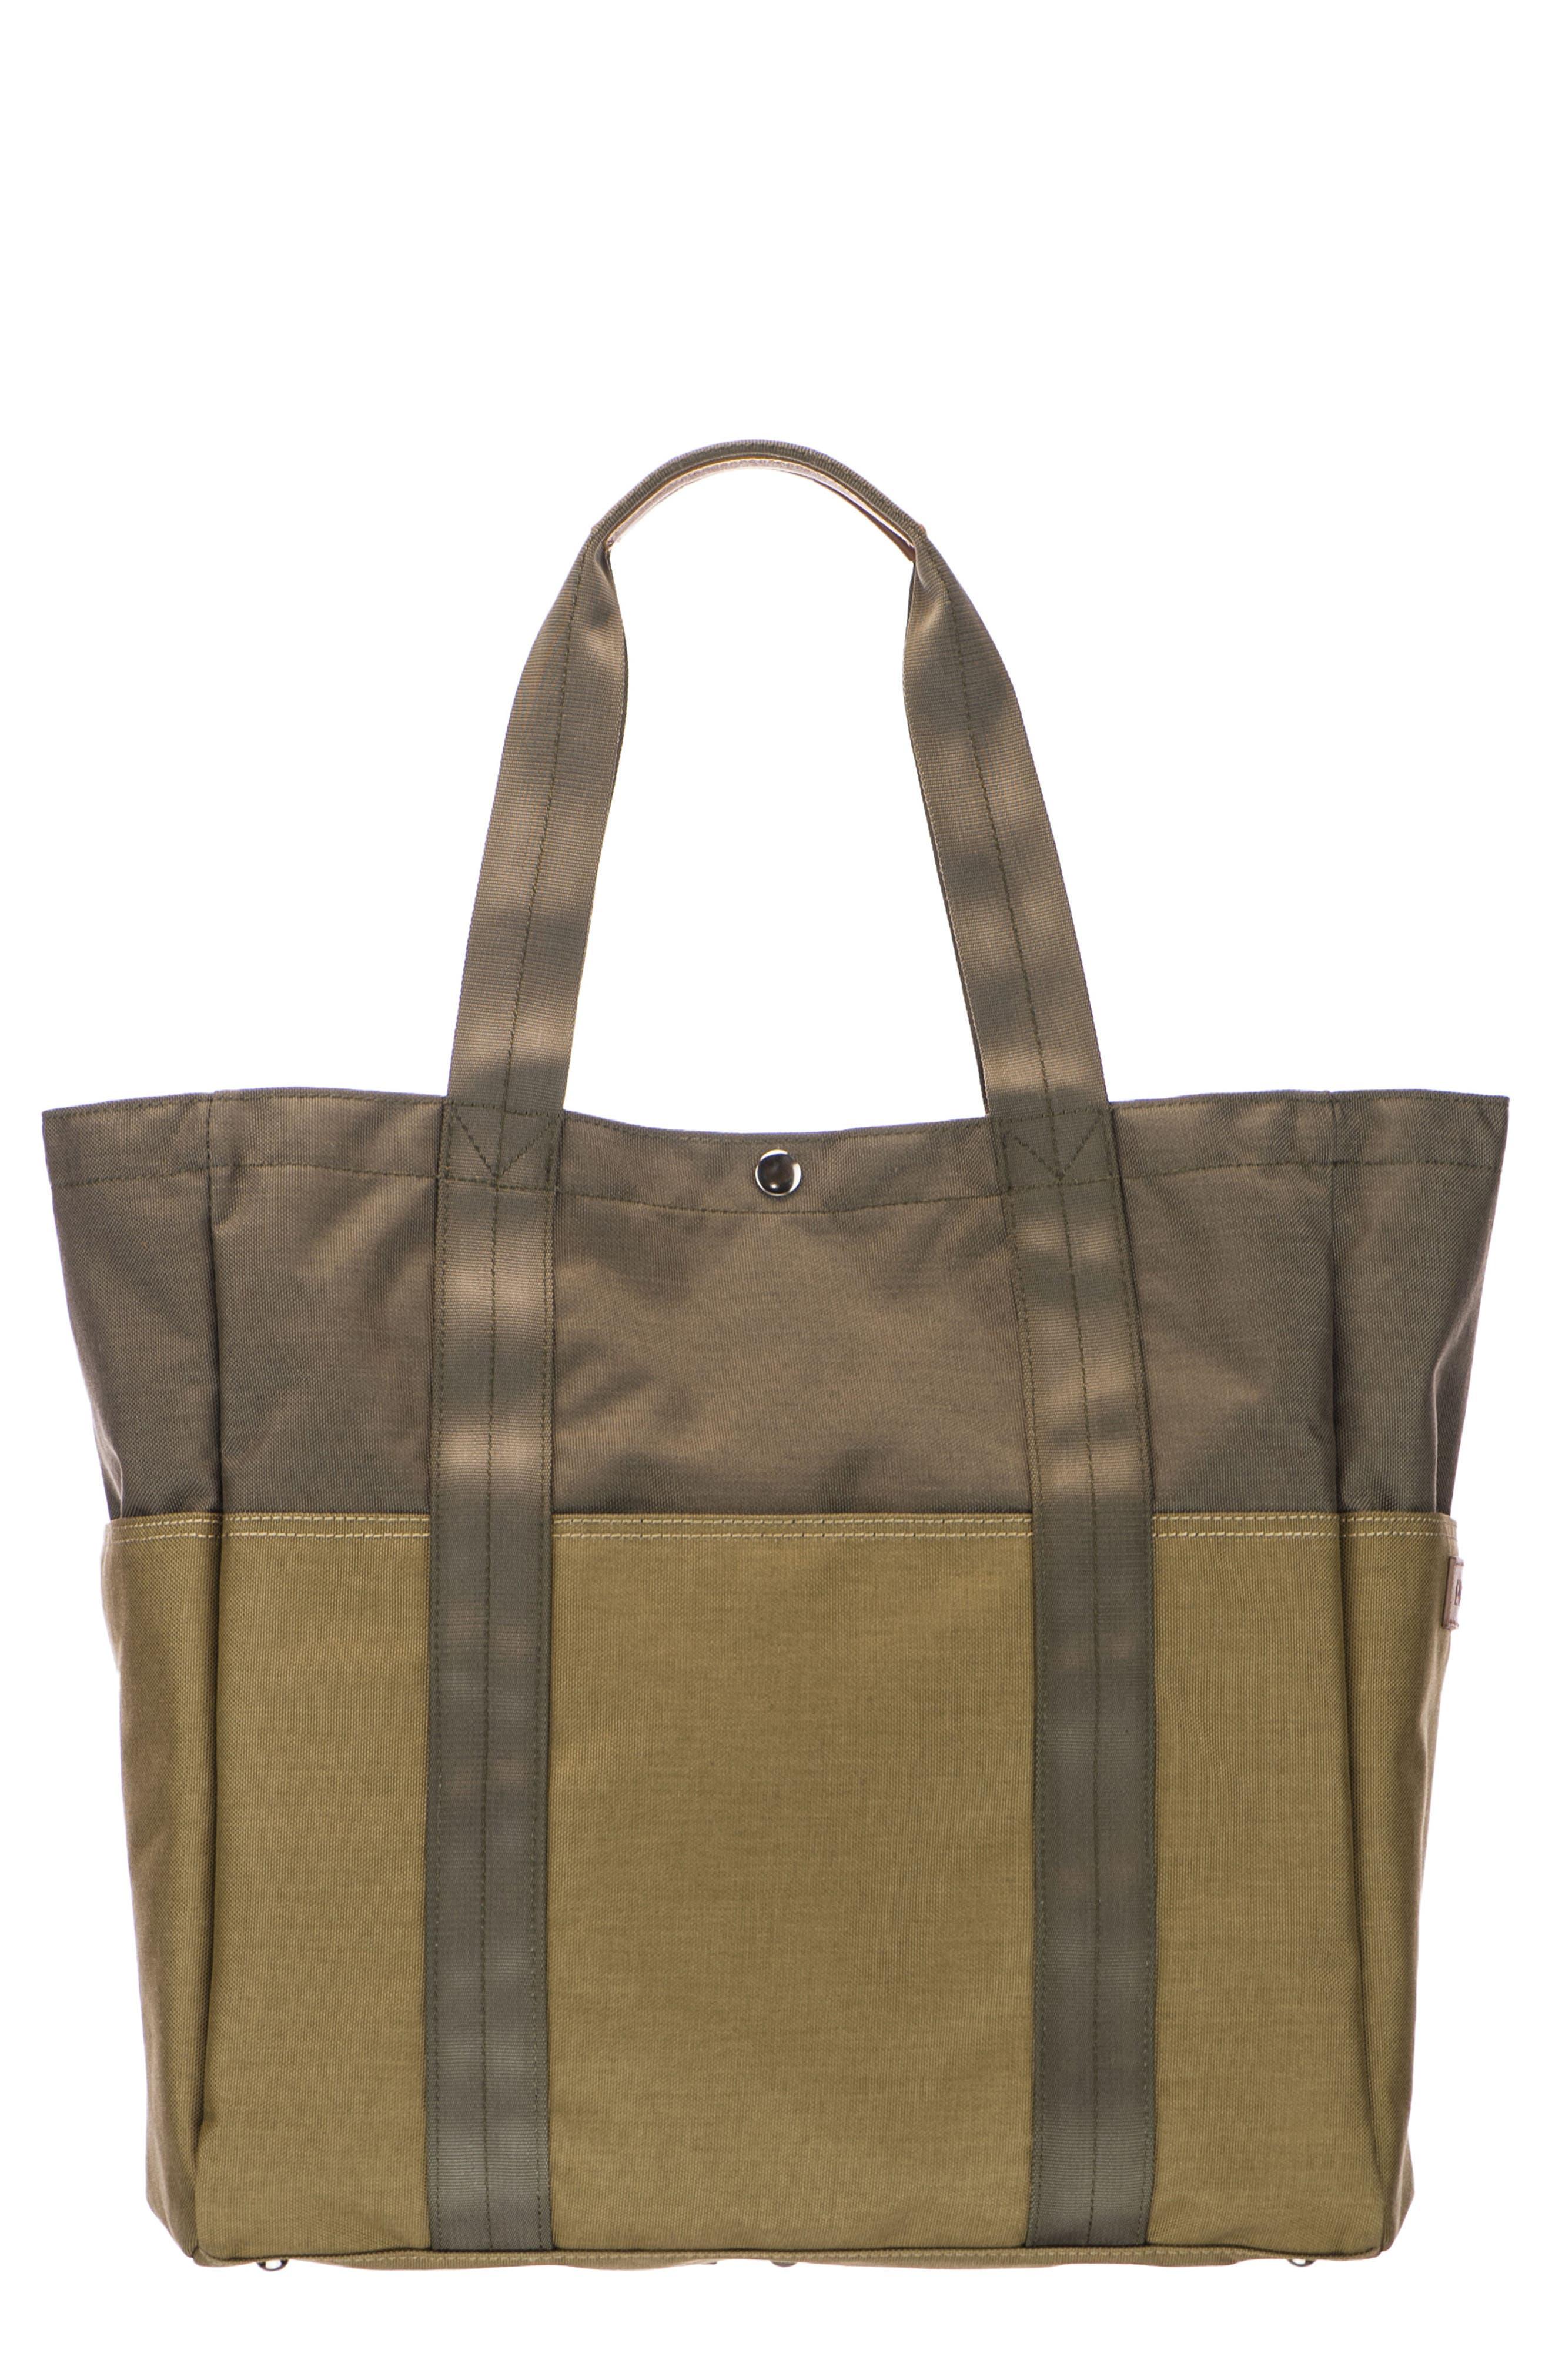 Main Image - Taikan Sherpa Tote Bag